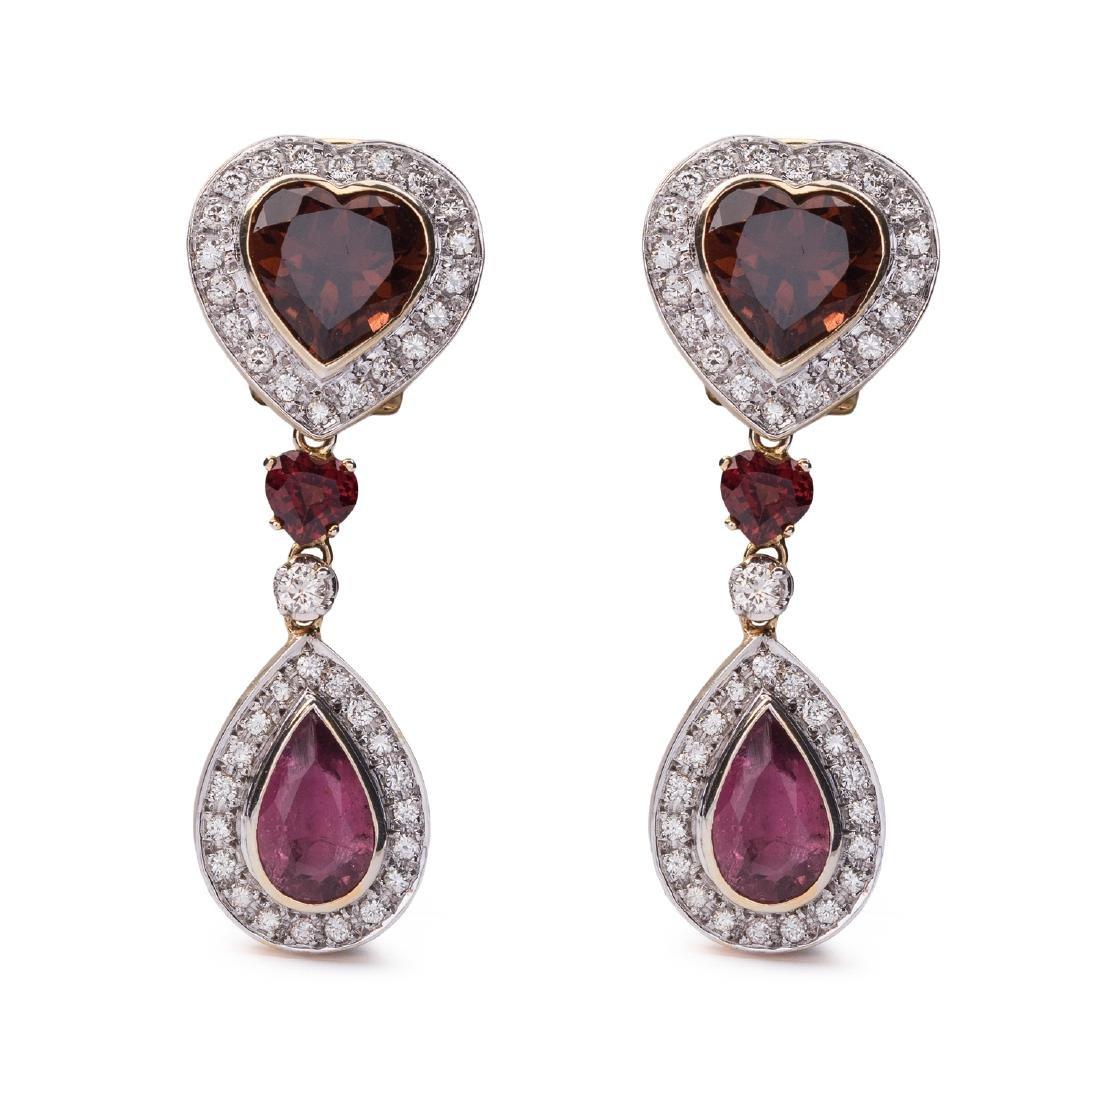 A pair of tourmaline pendant earrings